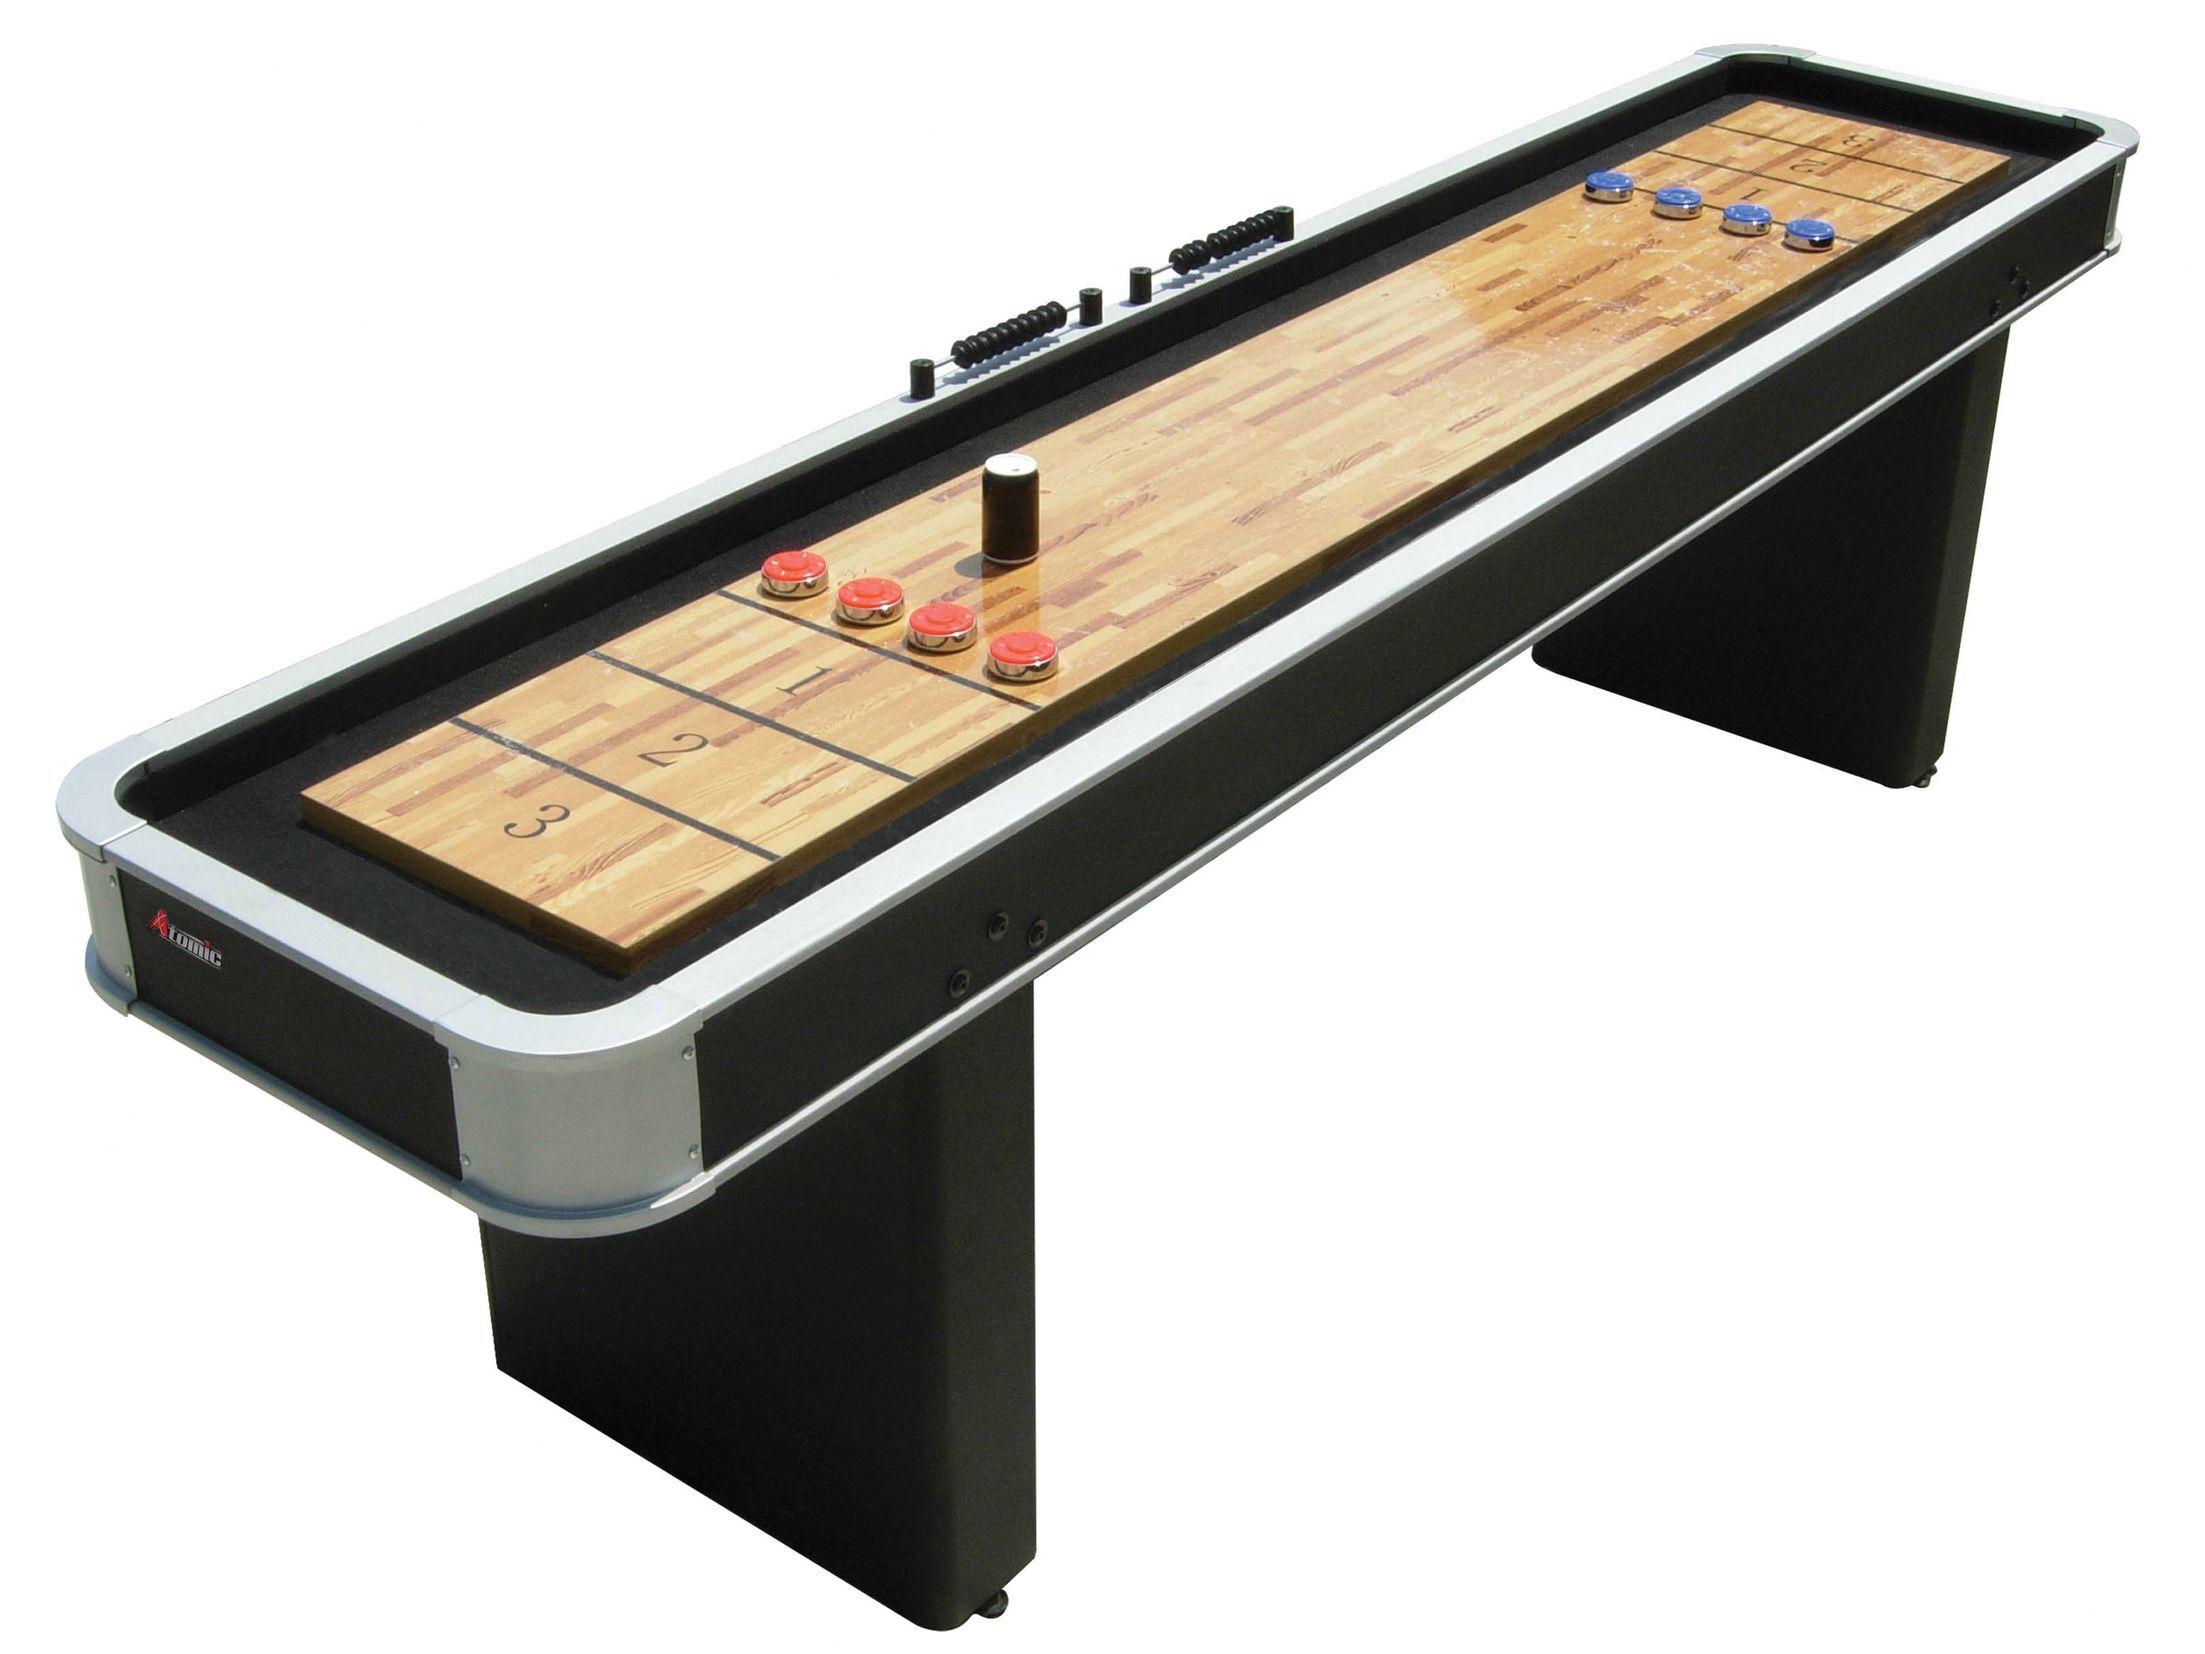 Atomic 9' Shuffleboard Table mancaves & ideas